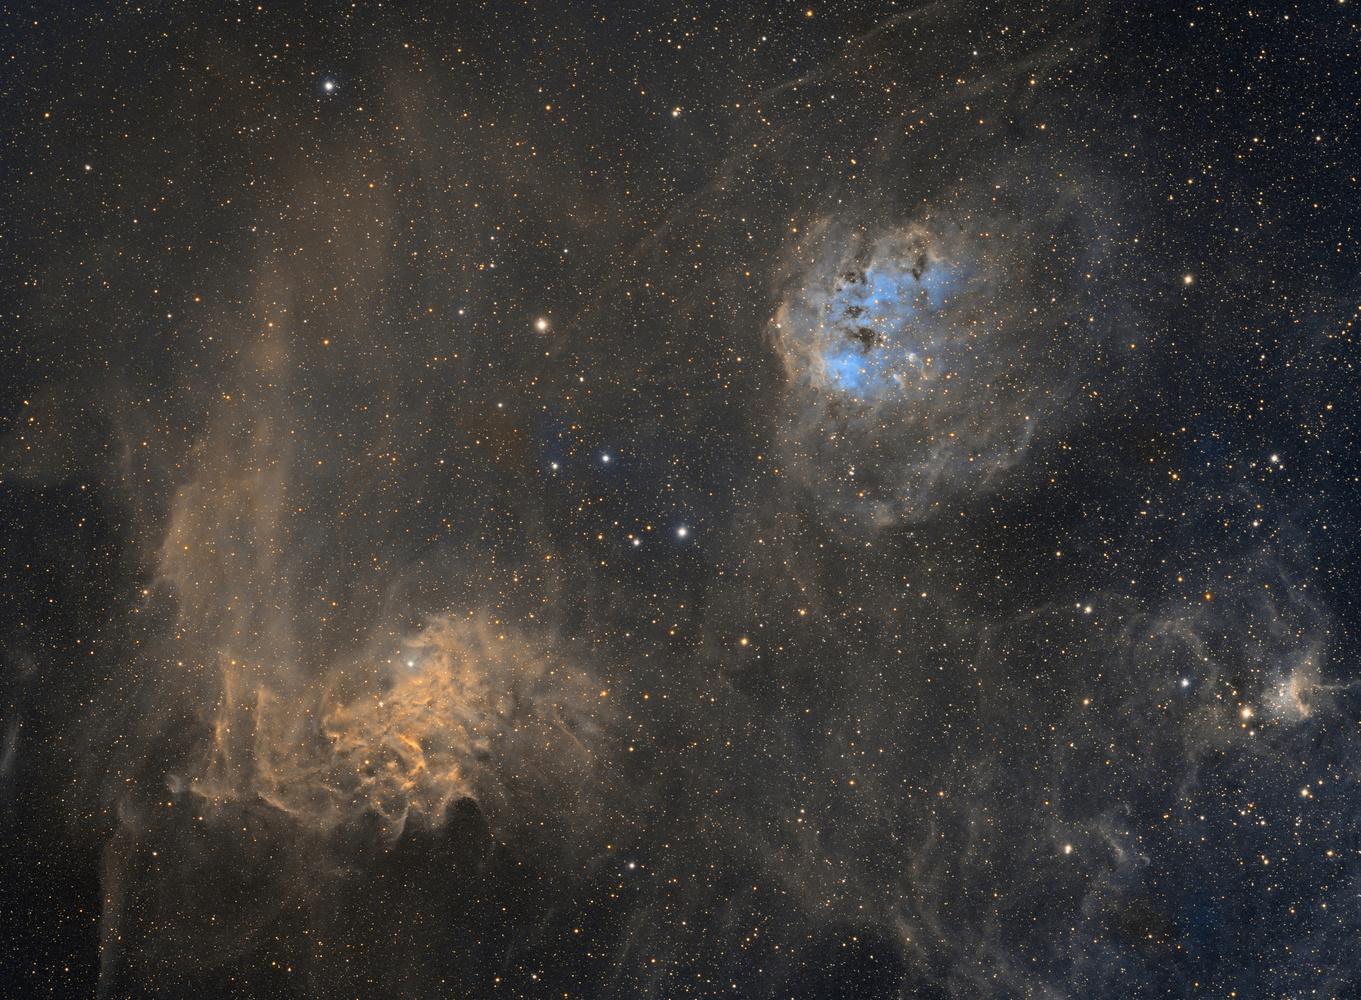 Flaming Star and Tadpole Nebulae by Josh Borup